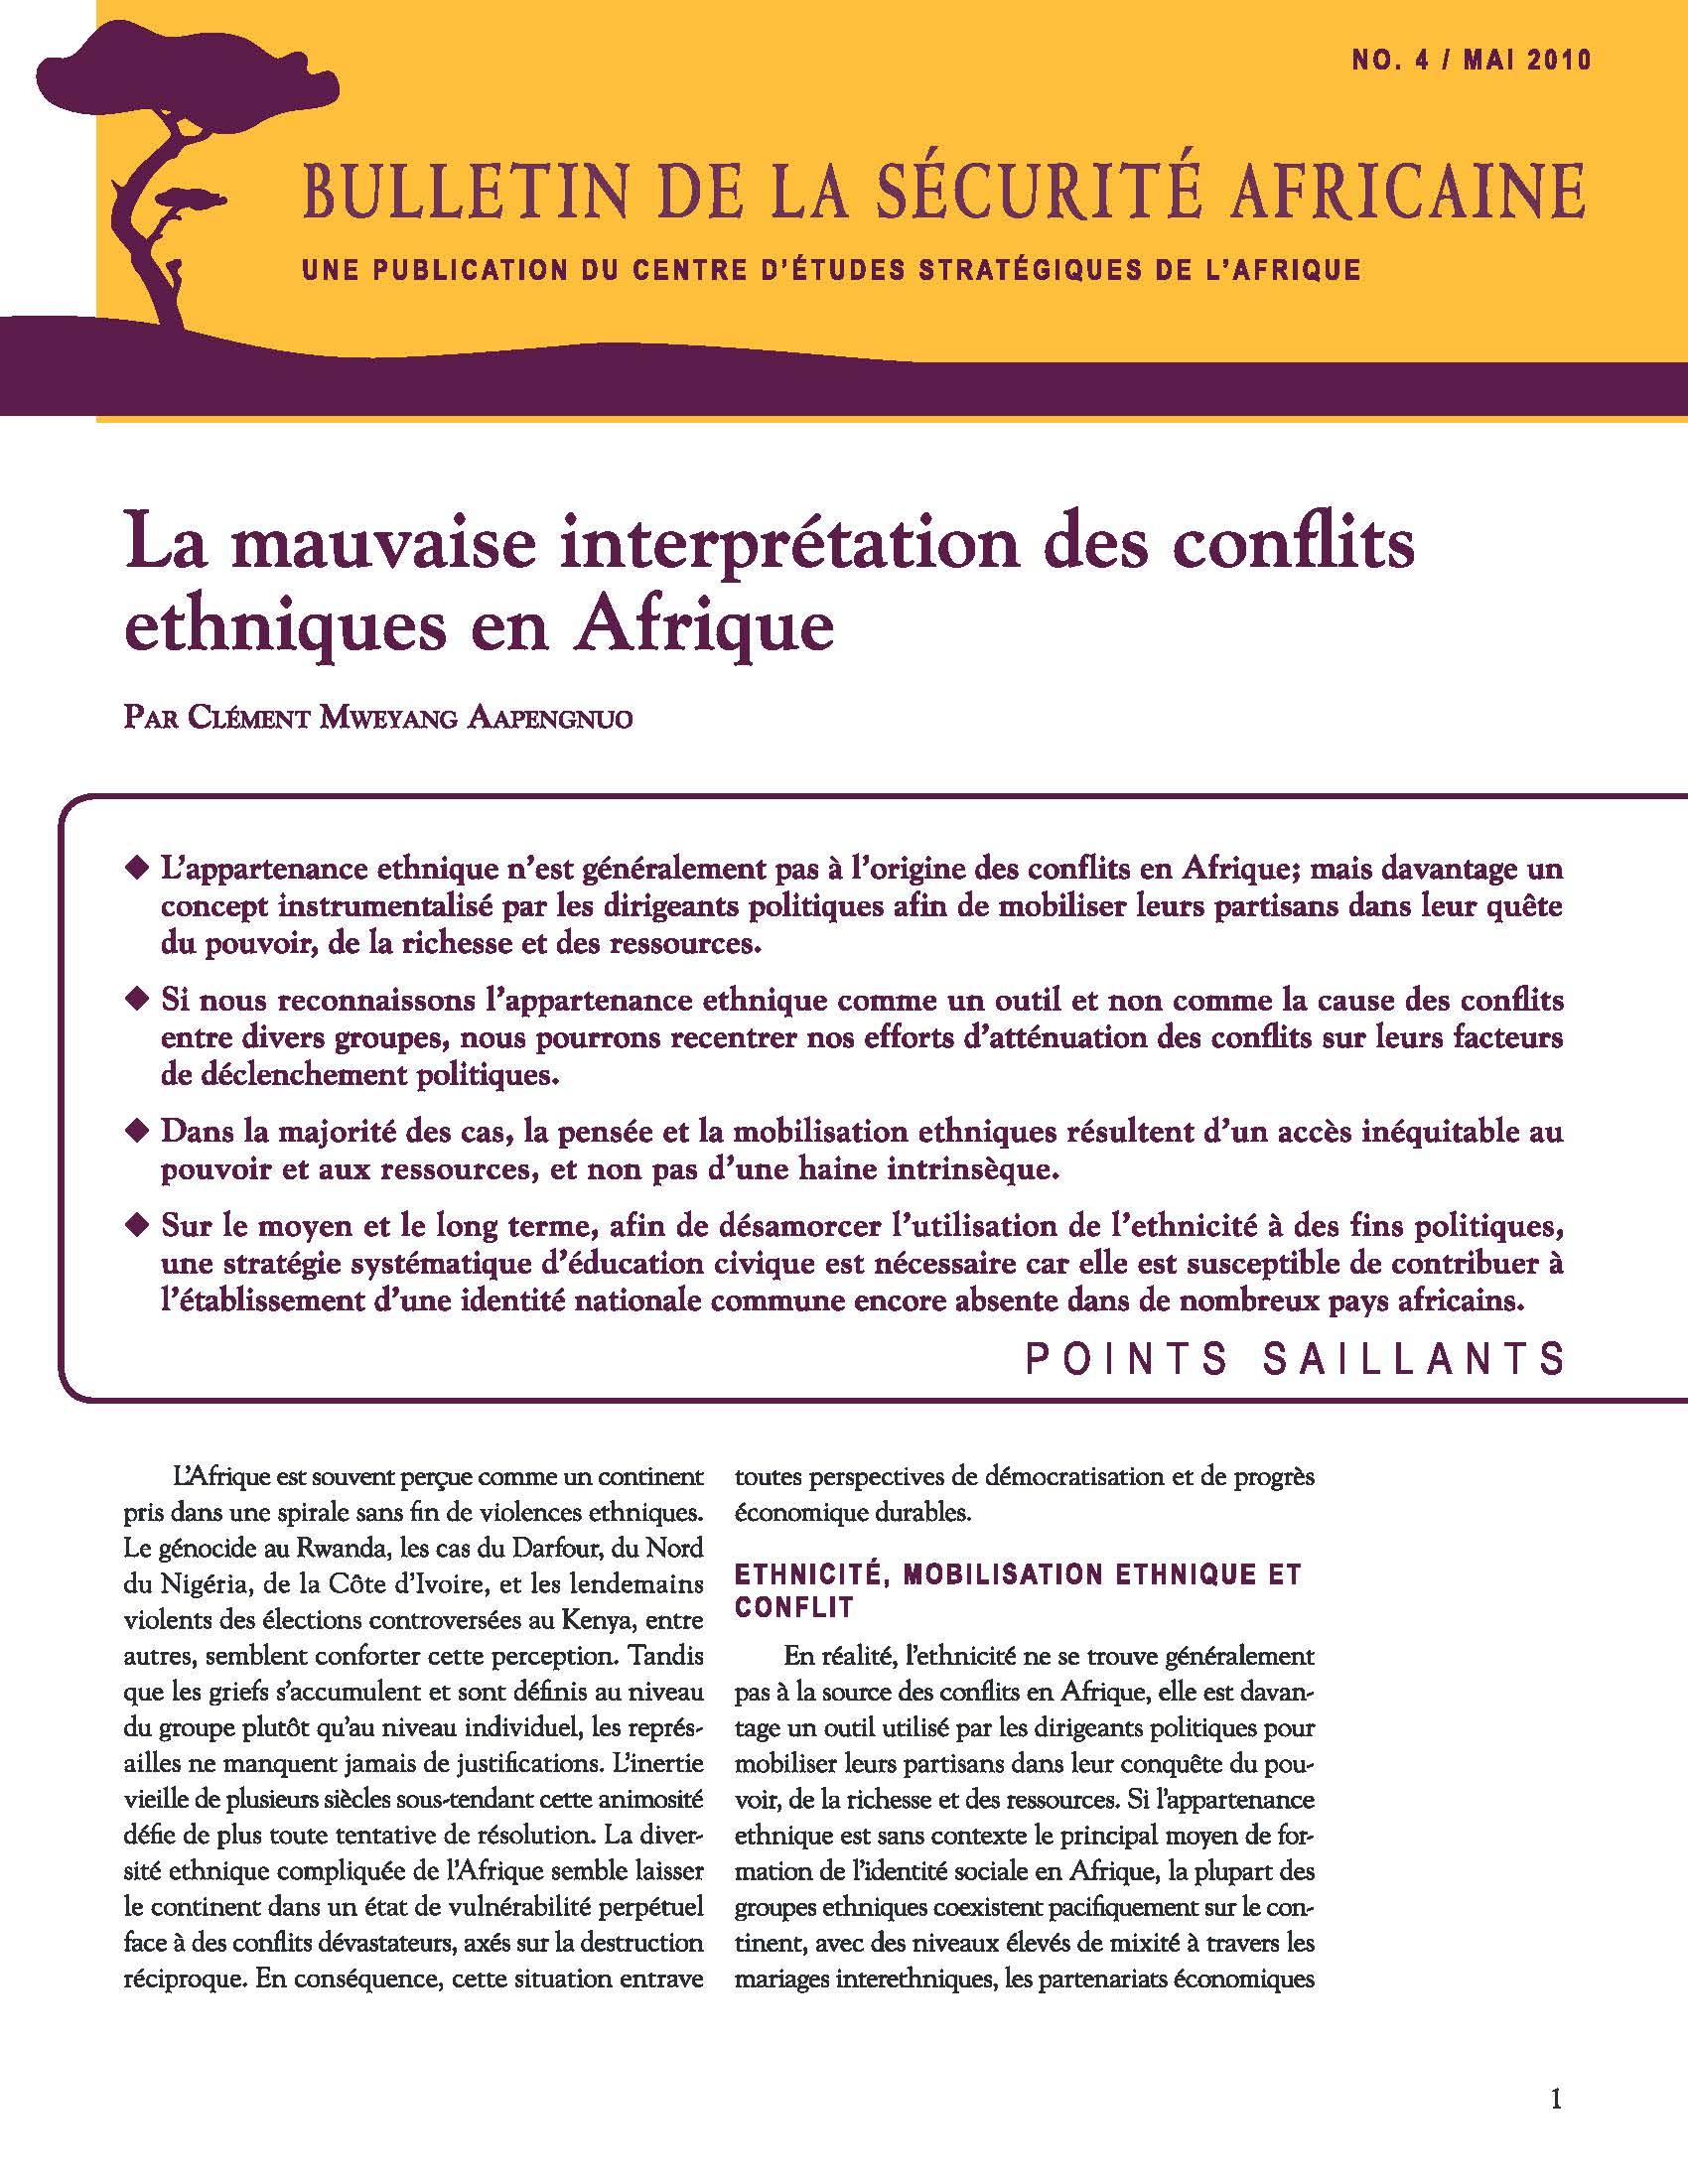 Africa-Security-Brief-No.-4-FR page 1